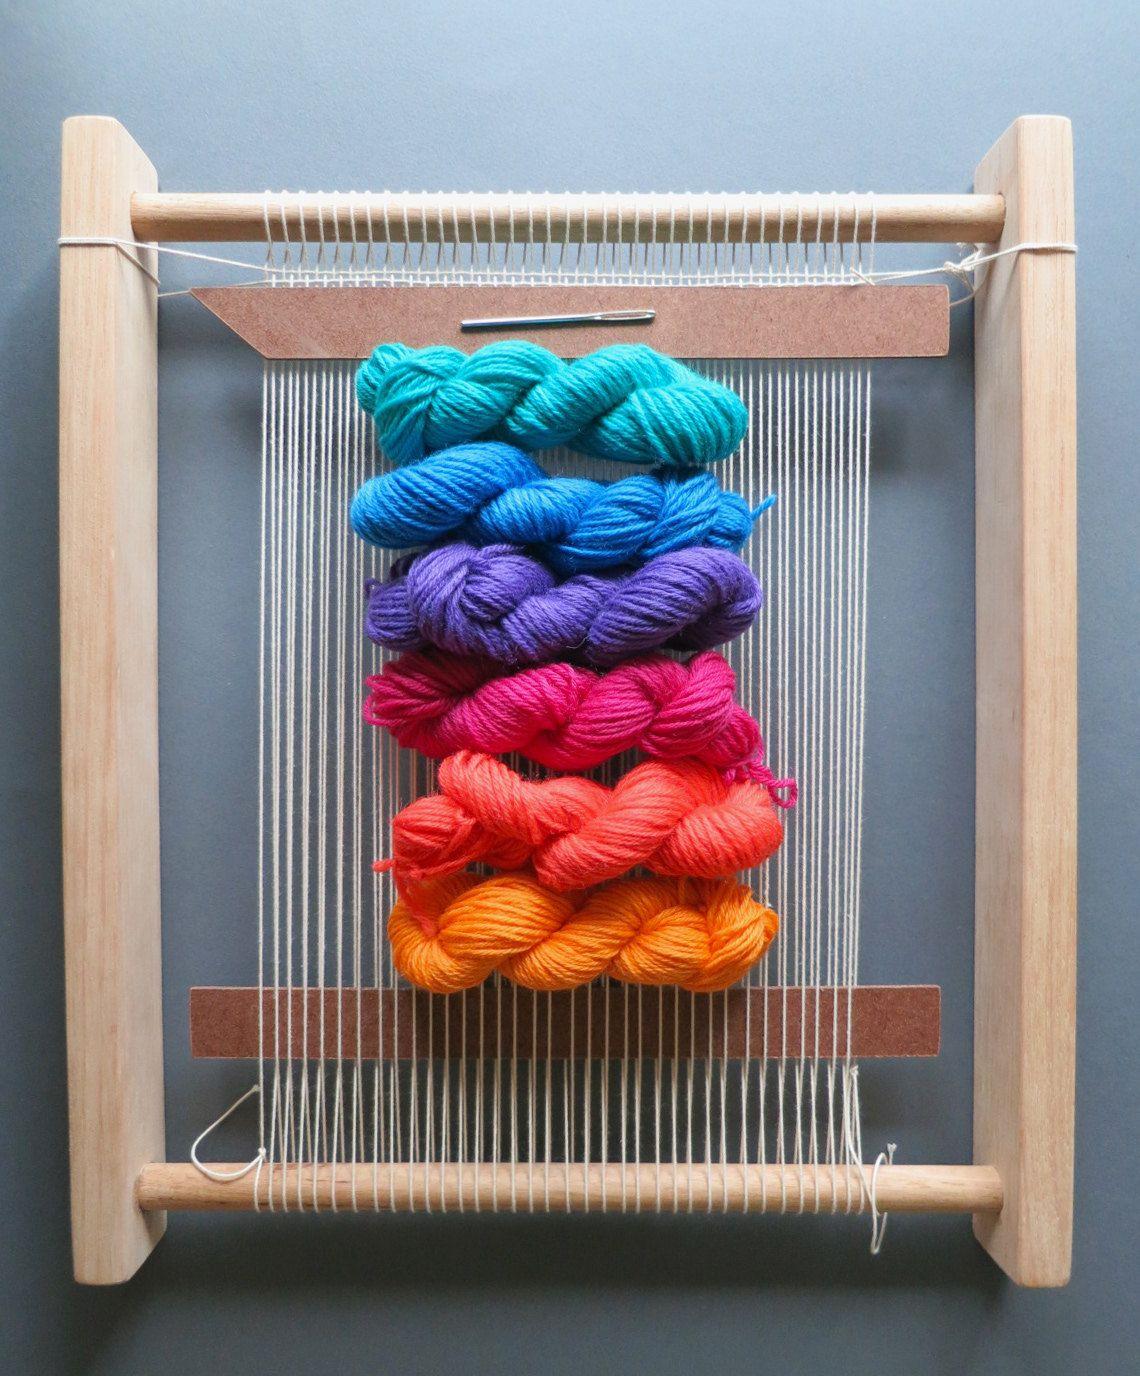 Weaving Loom Kit Weaving Frame Shed Stick Yarn Needle